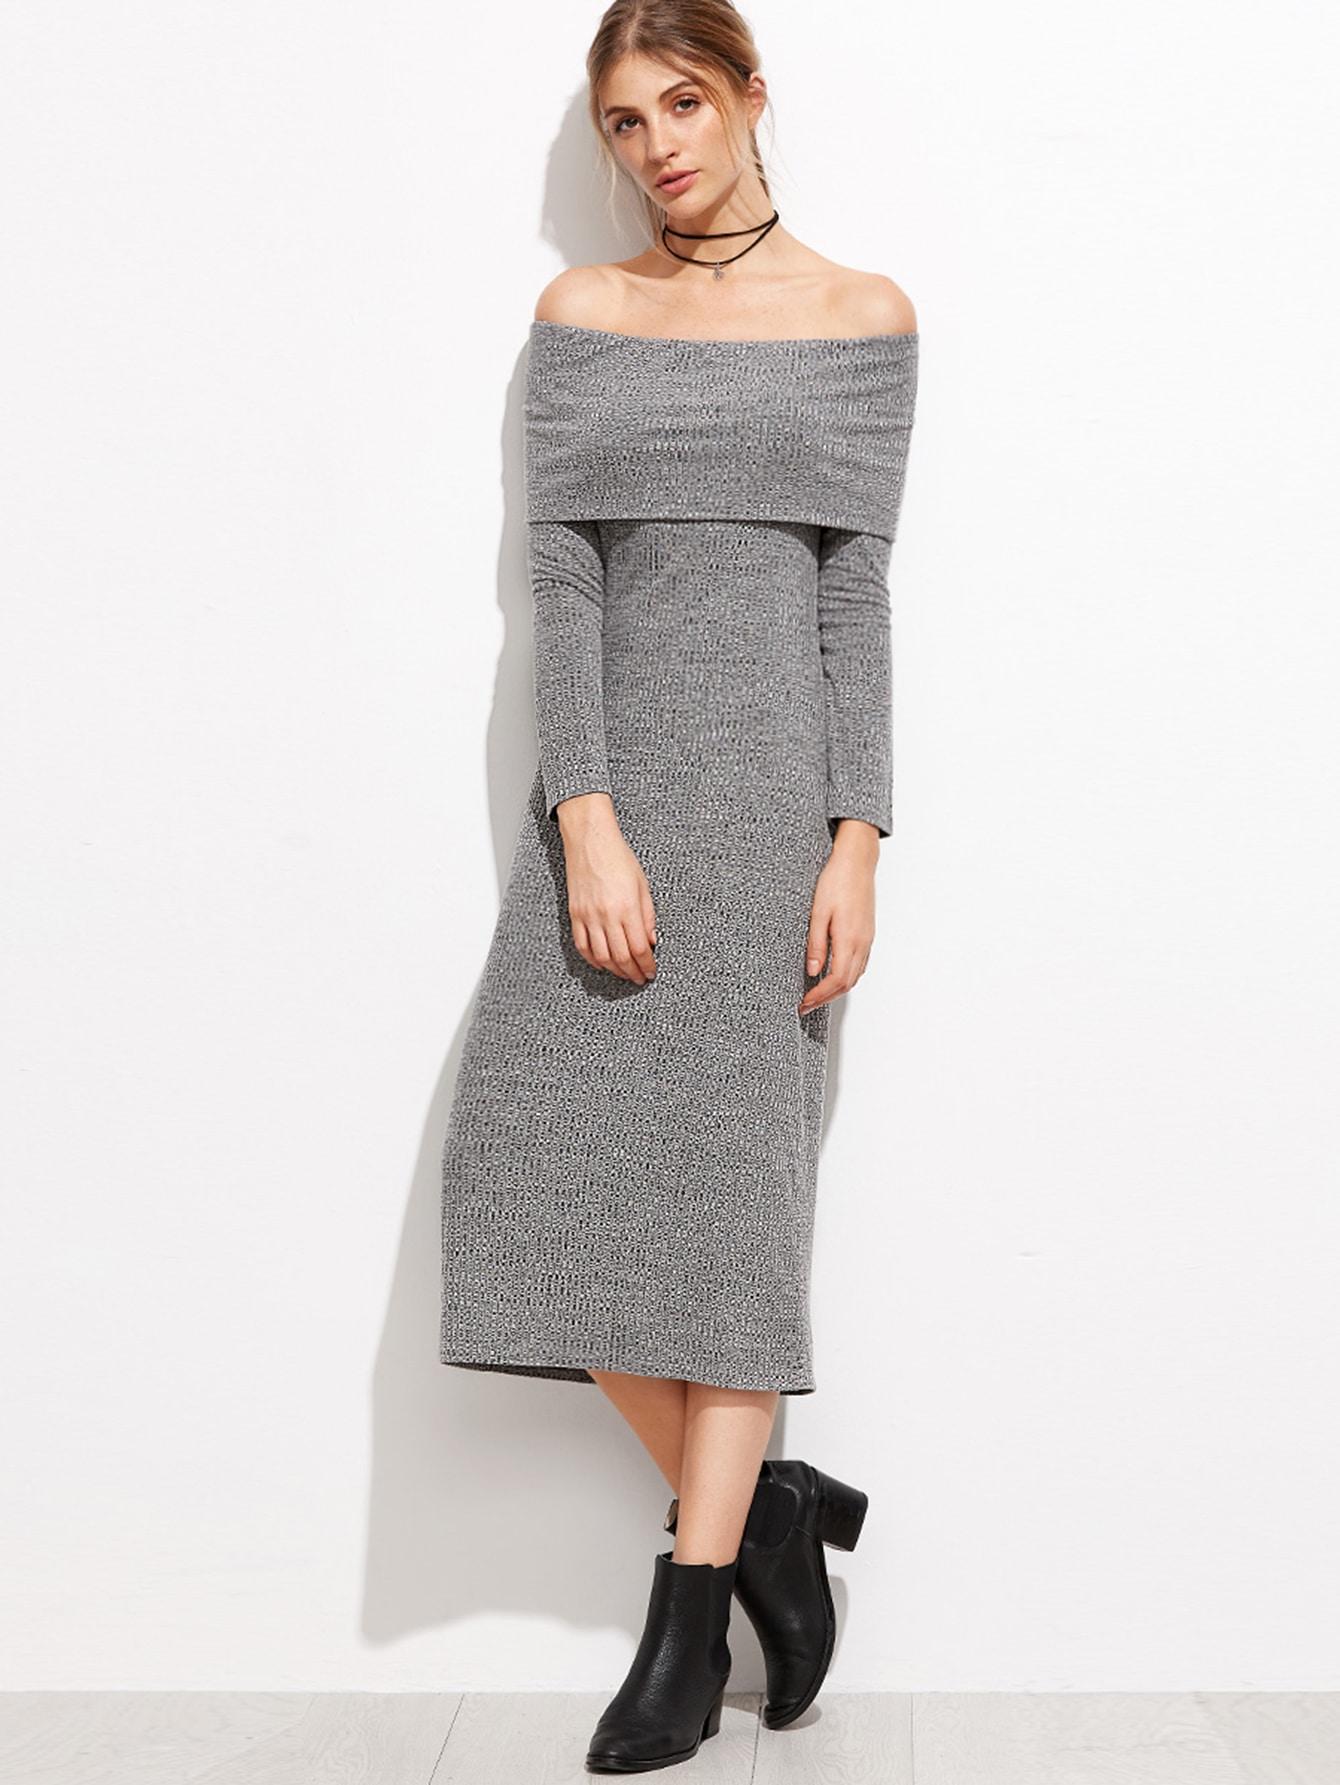 Heather Grey Foldover Off The Shoulder Ribbed Dress dress160920706